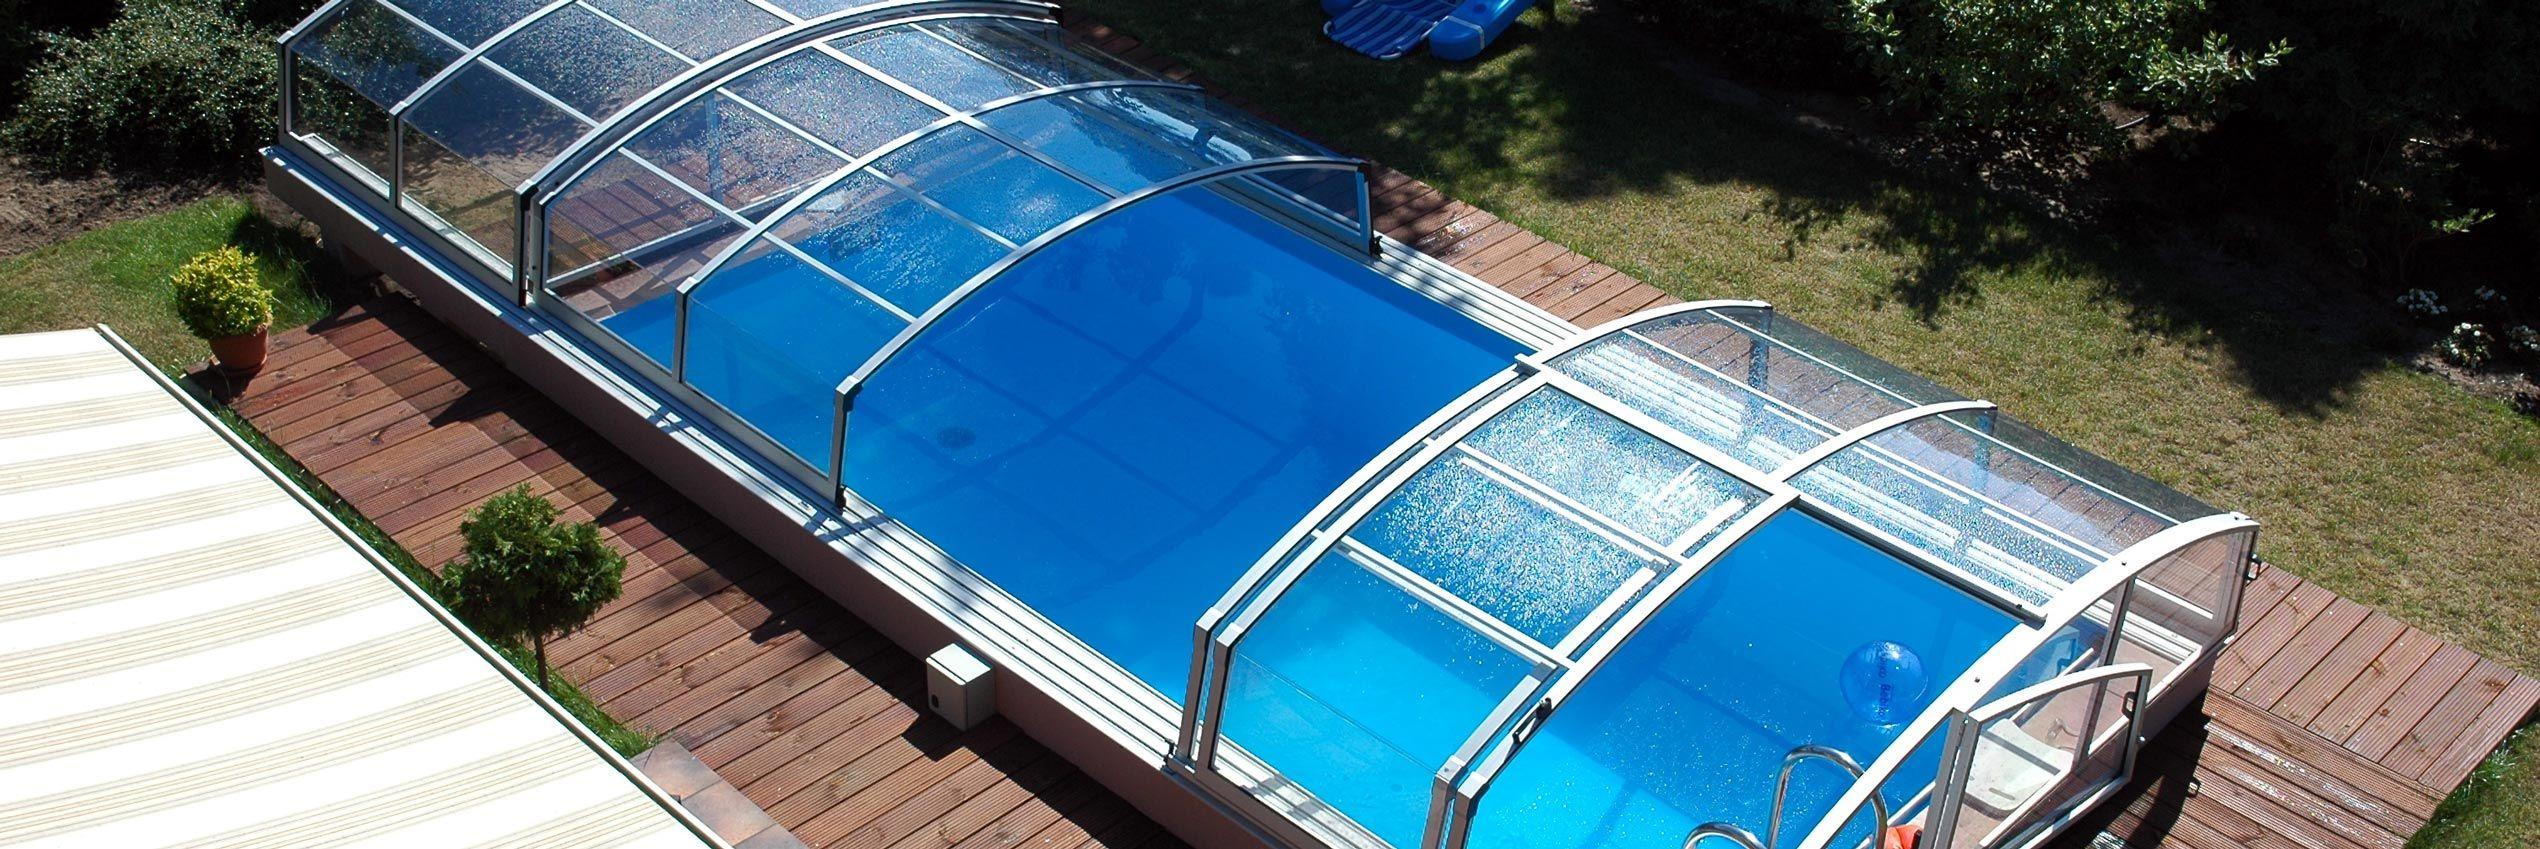 Abri de piscine imperia neo for Abri de piscine sesame